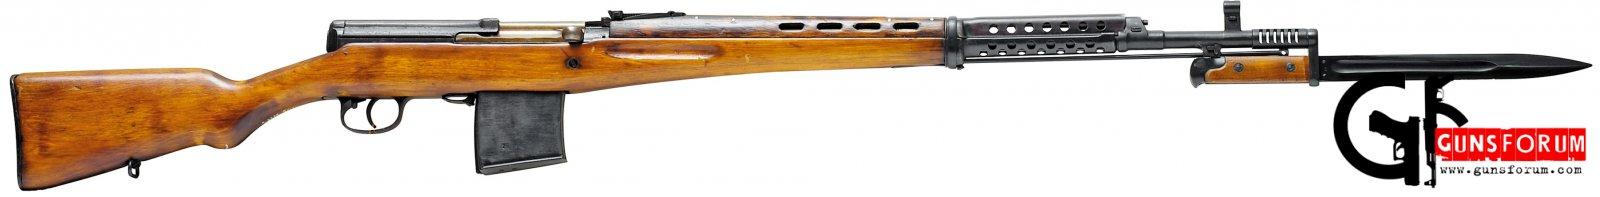 Самозарядная винтовка Токарева (СВТ) Tokarev semiautomatic rifle (SVT)